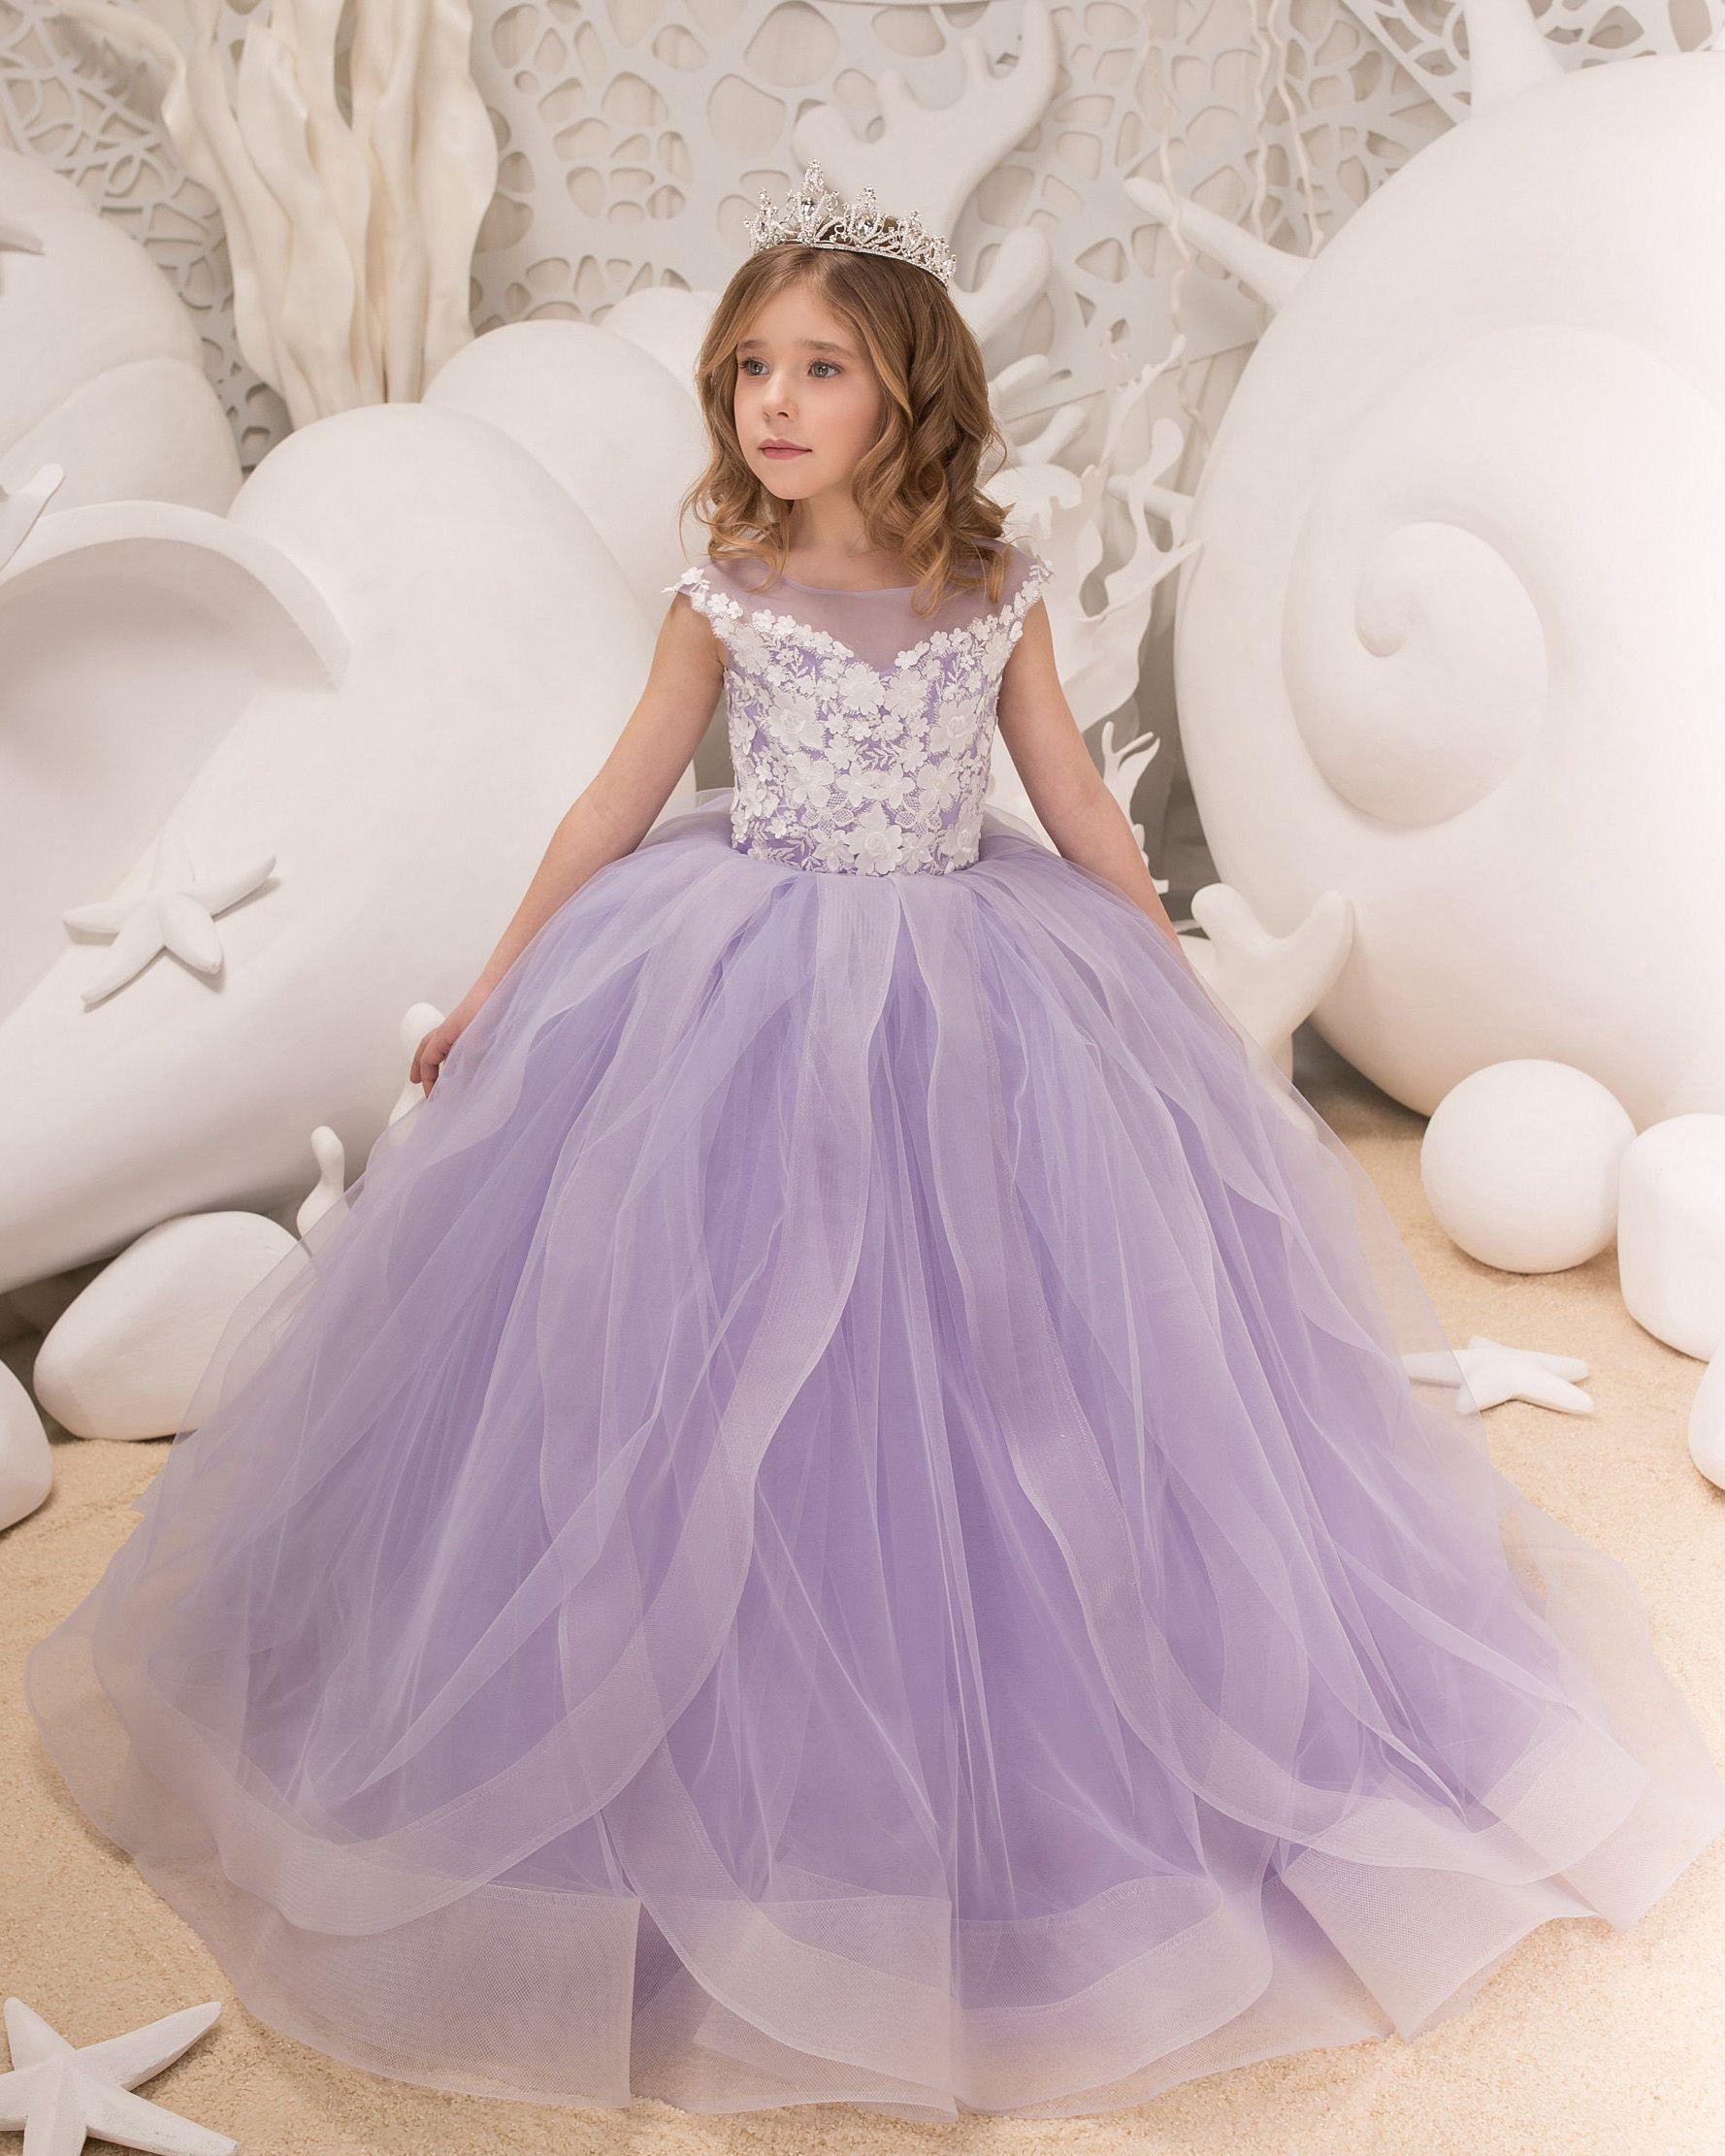 Lavender lace tulle flower girl dress girls party dress